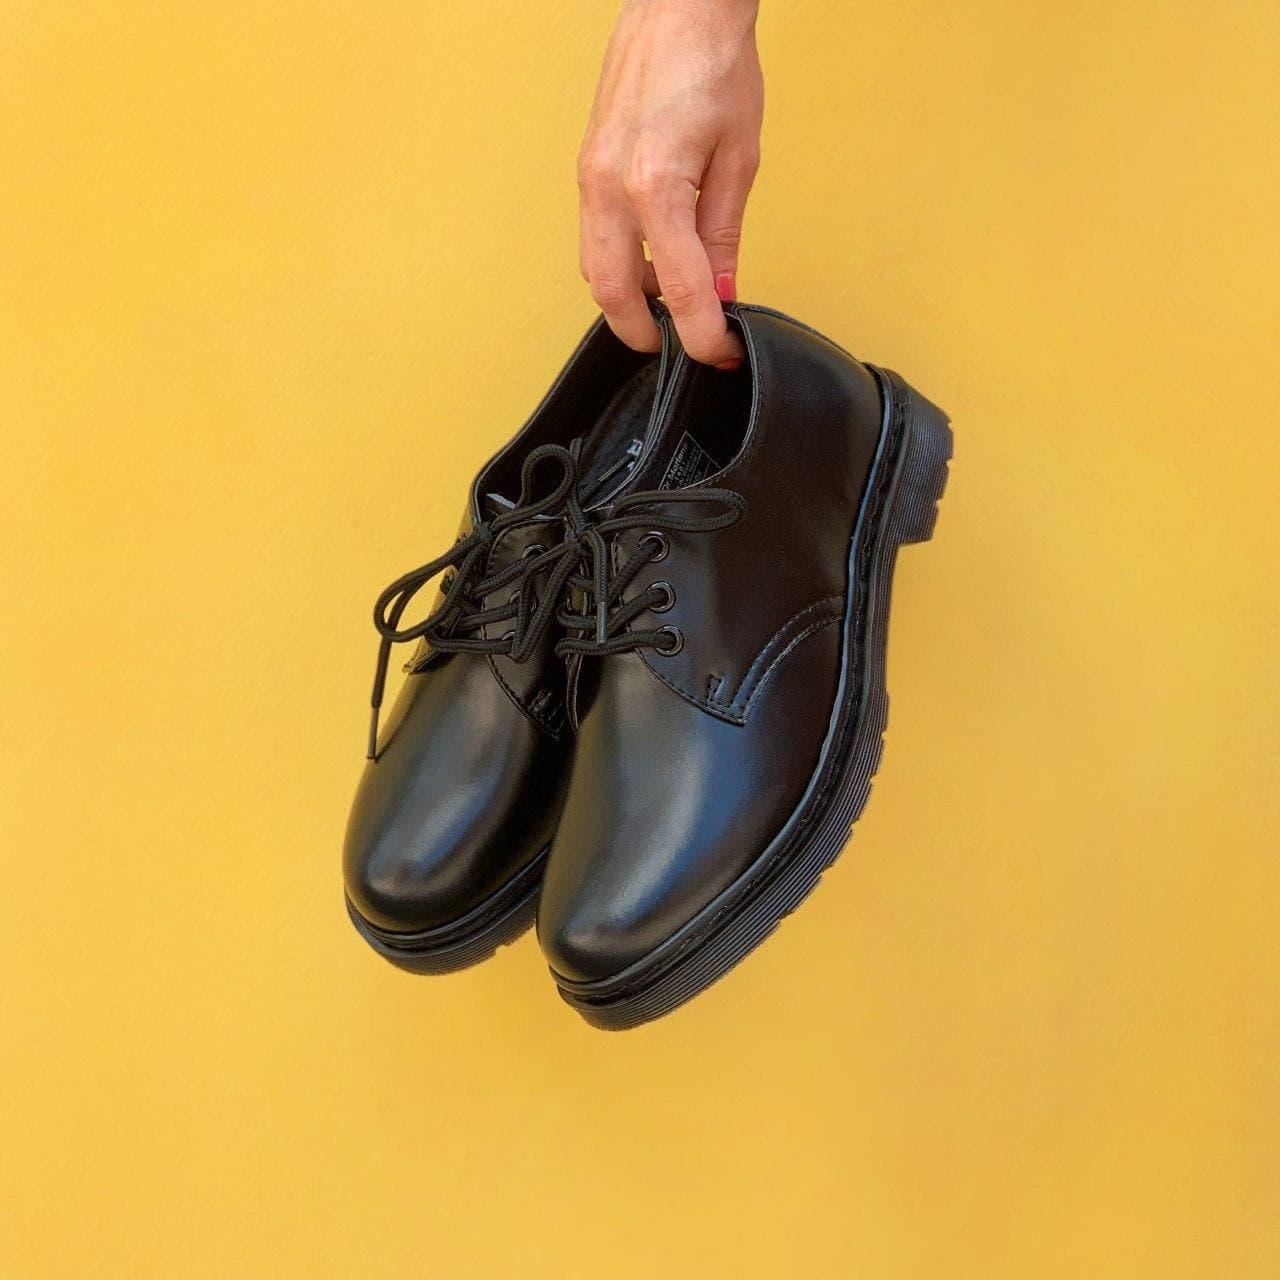 Жіночі туфлі Dr. Martens 1461 Mono black